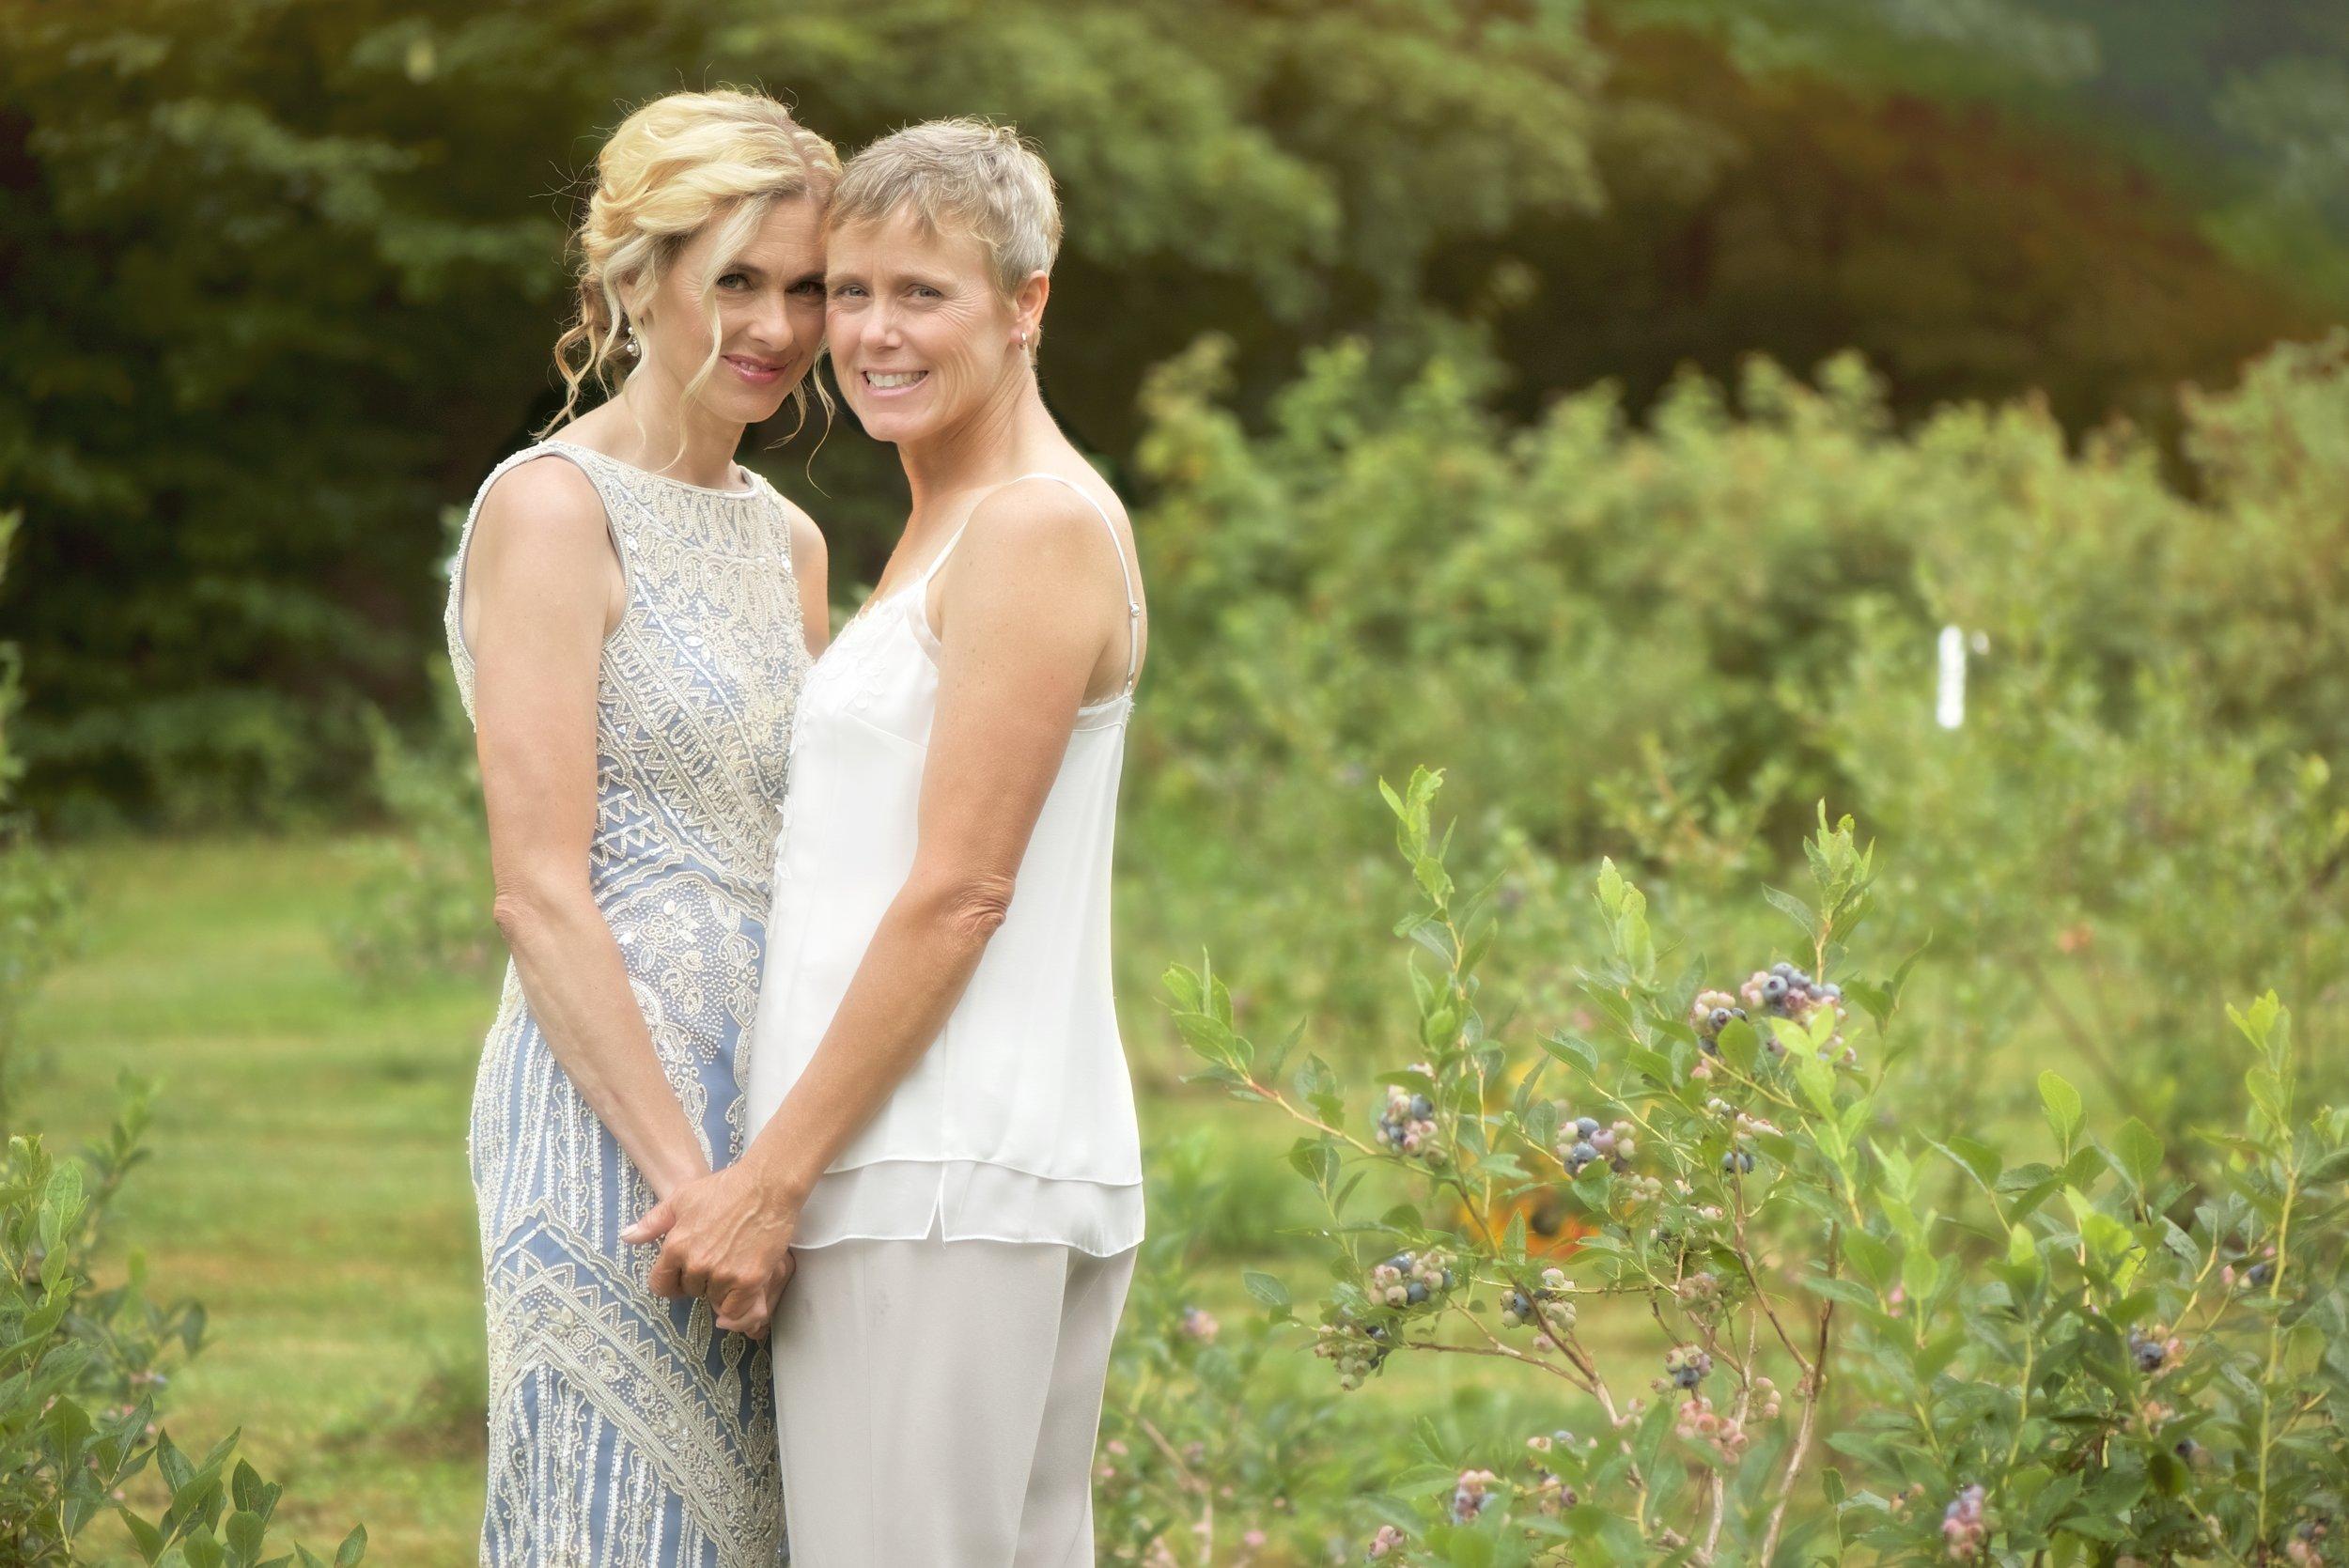 Same sex wedding portrait of two brides